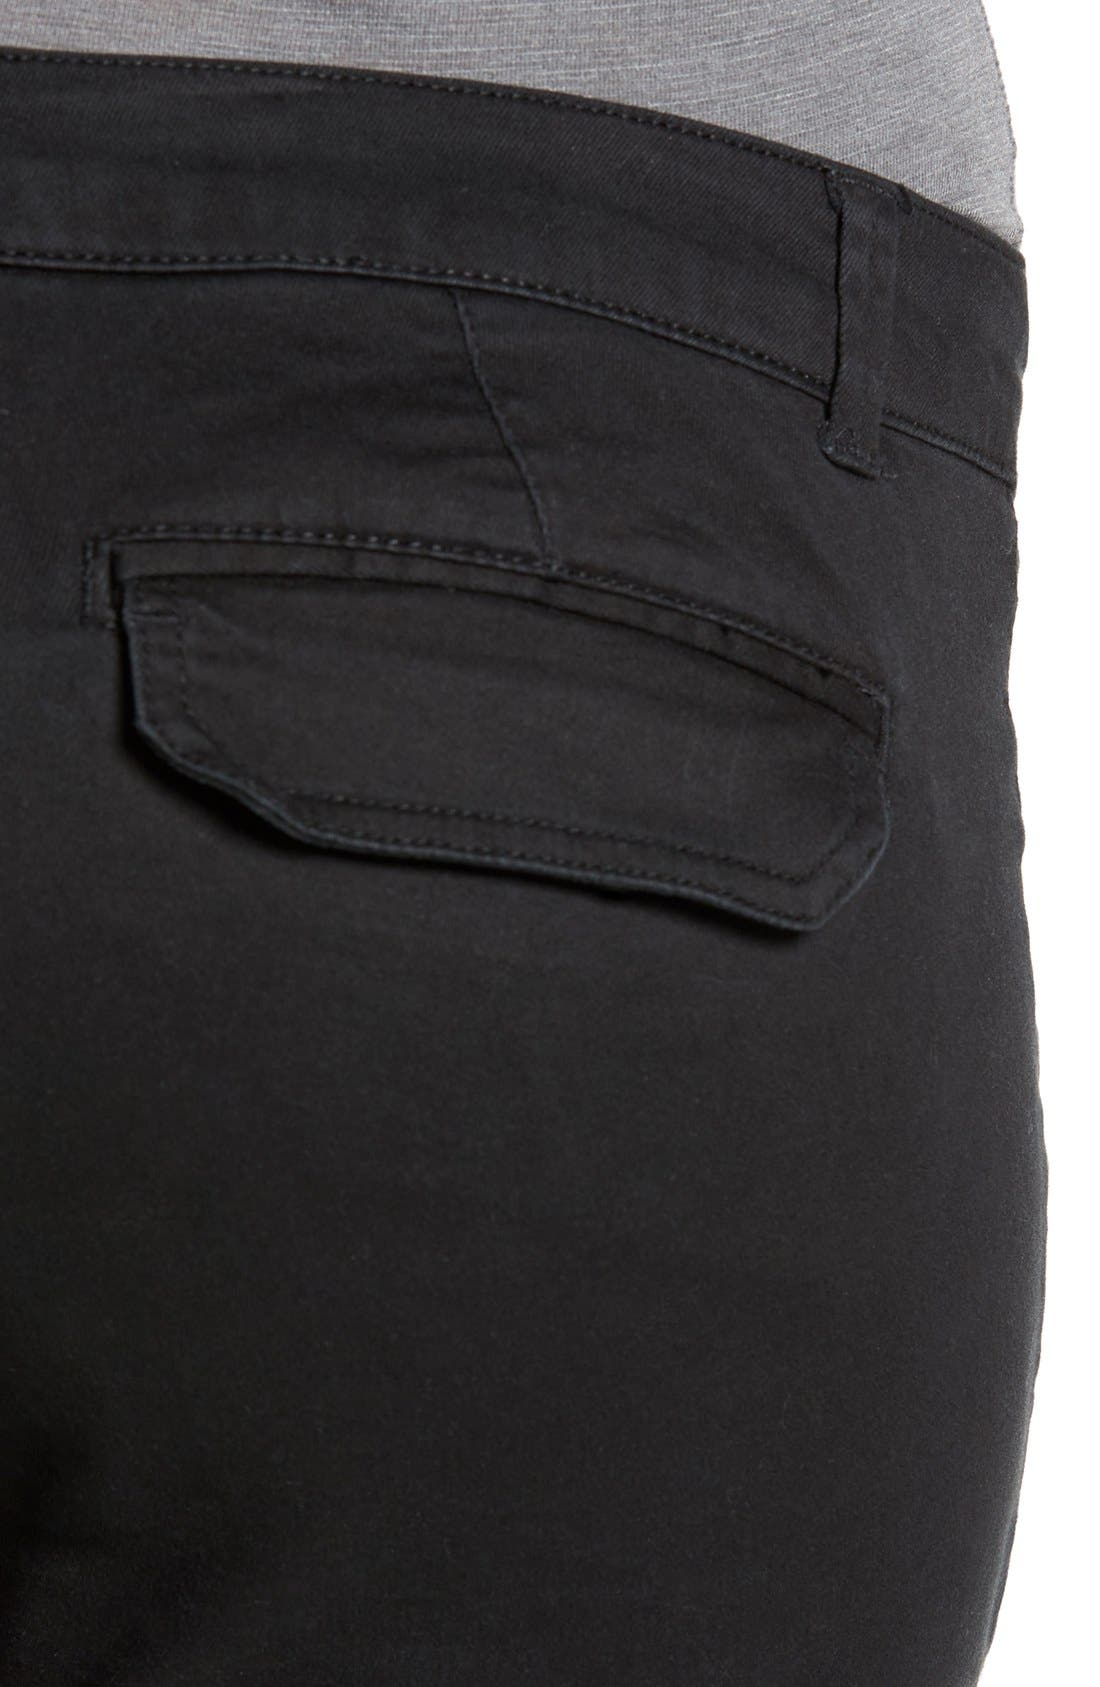 Alternate Image 6  - Wit & Wisdom Skinny Cargo Pants (Regular & Petite) (Nordstrom Exclusive)